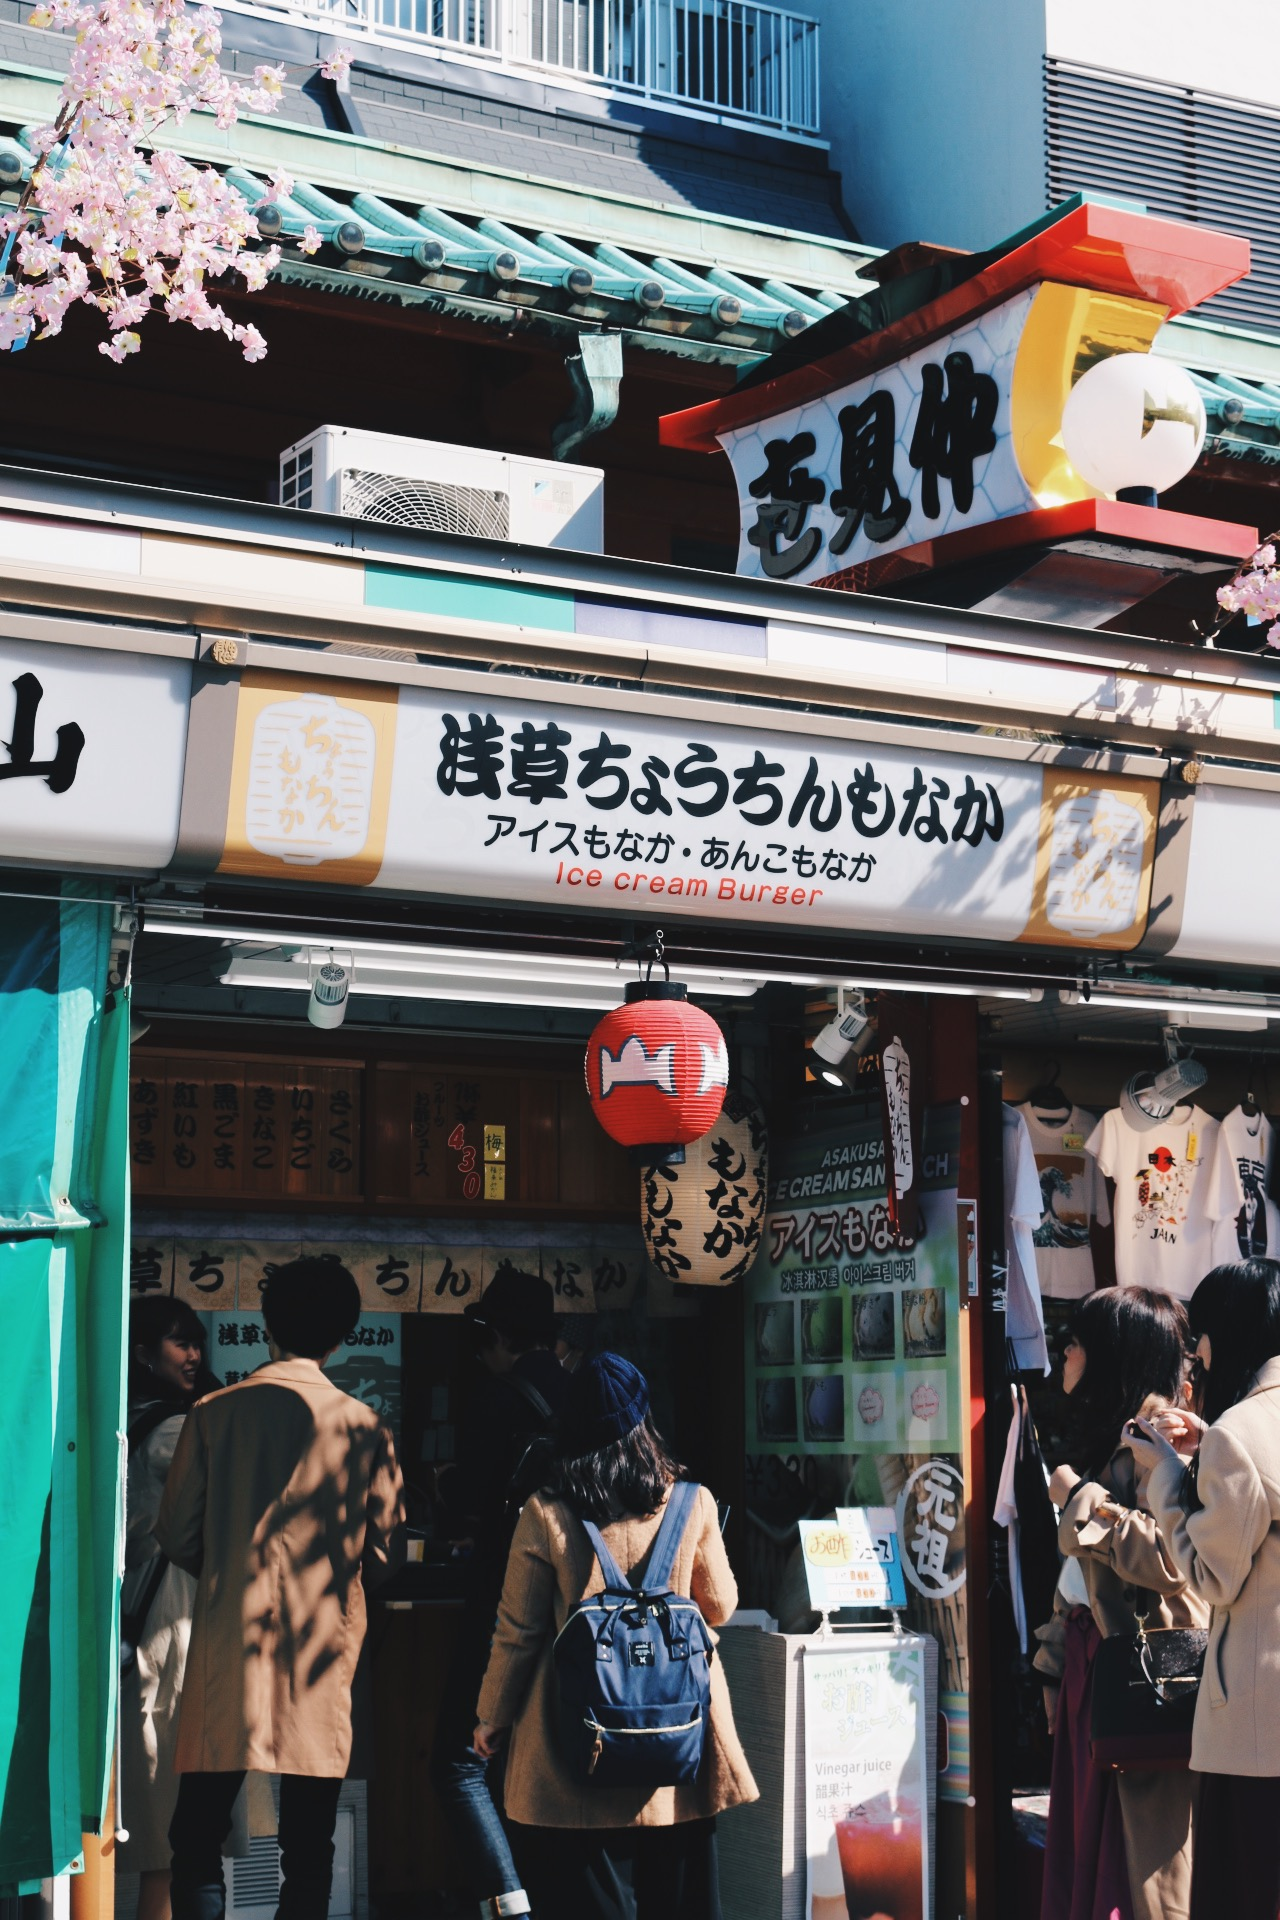 Ice cream burgers at Nakamise street